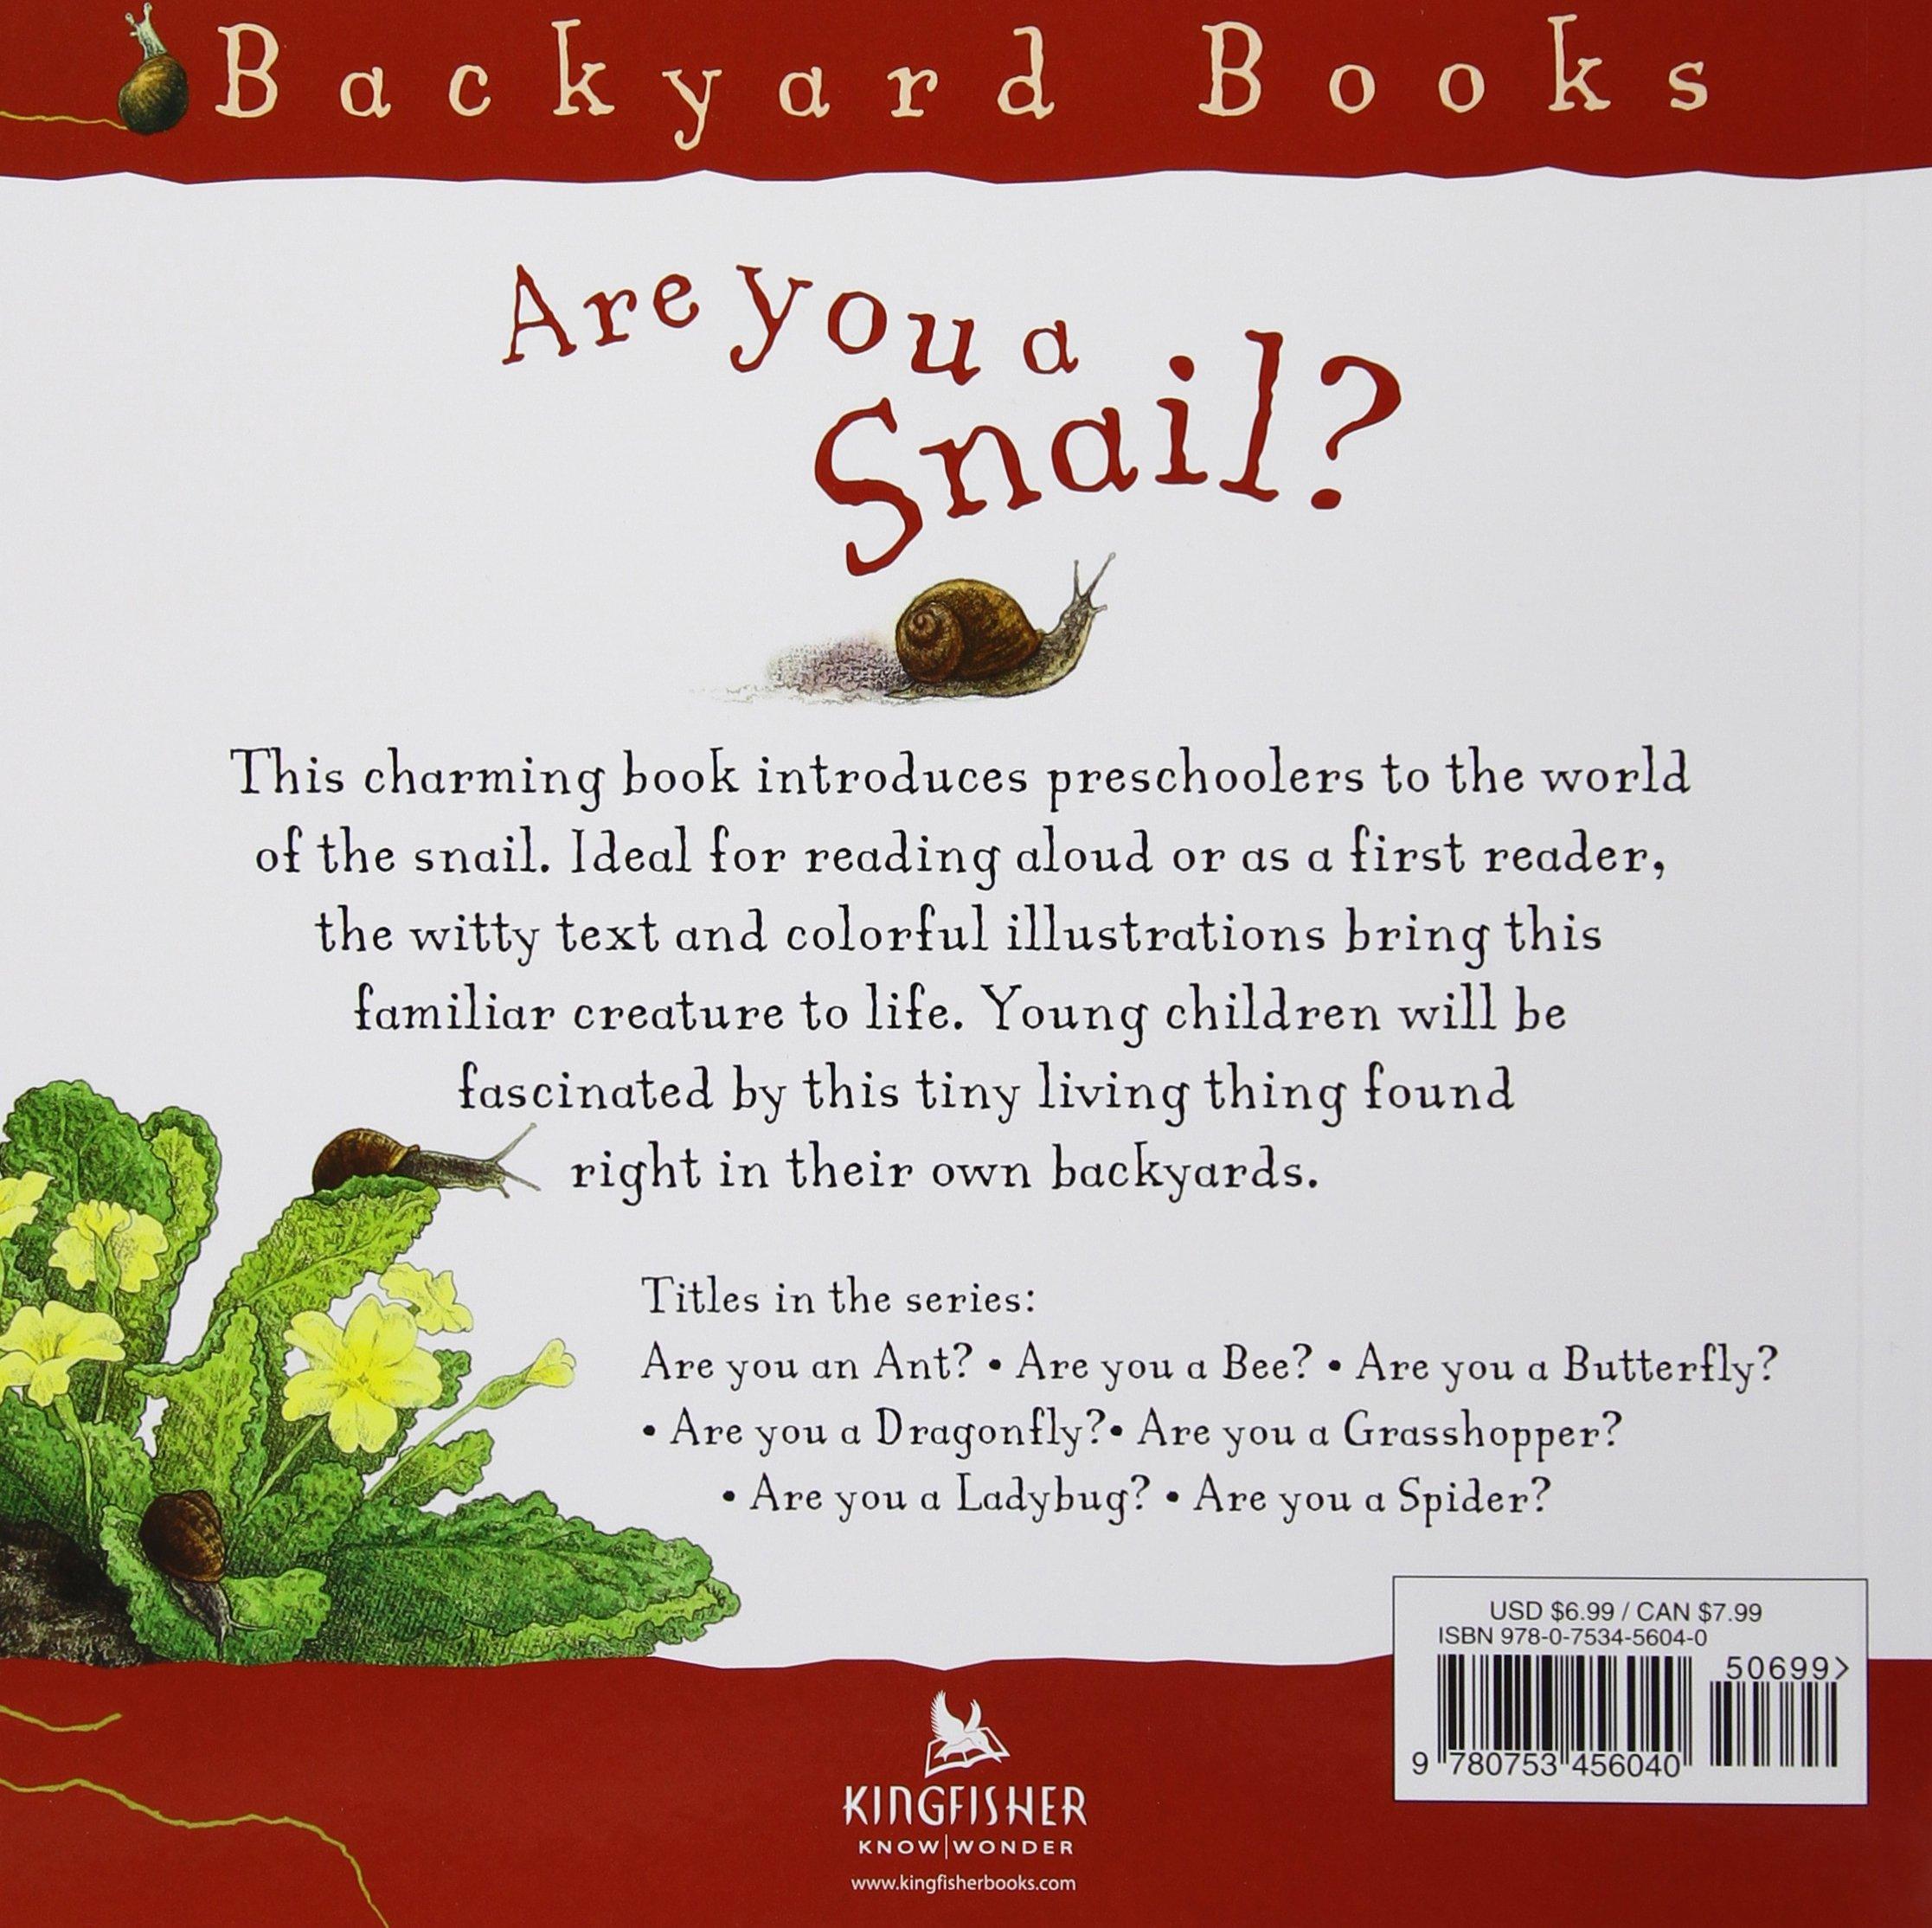 are you a snail backyard books judy allen tudor humphries